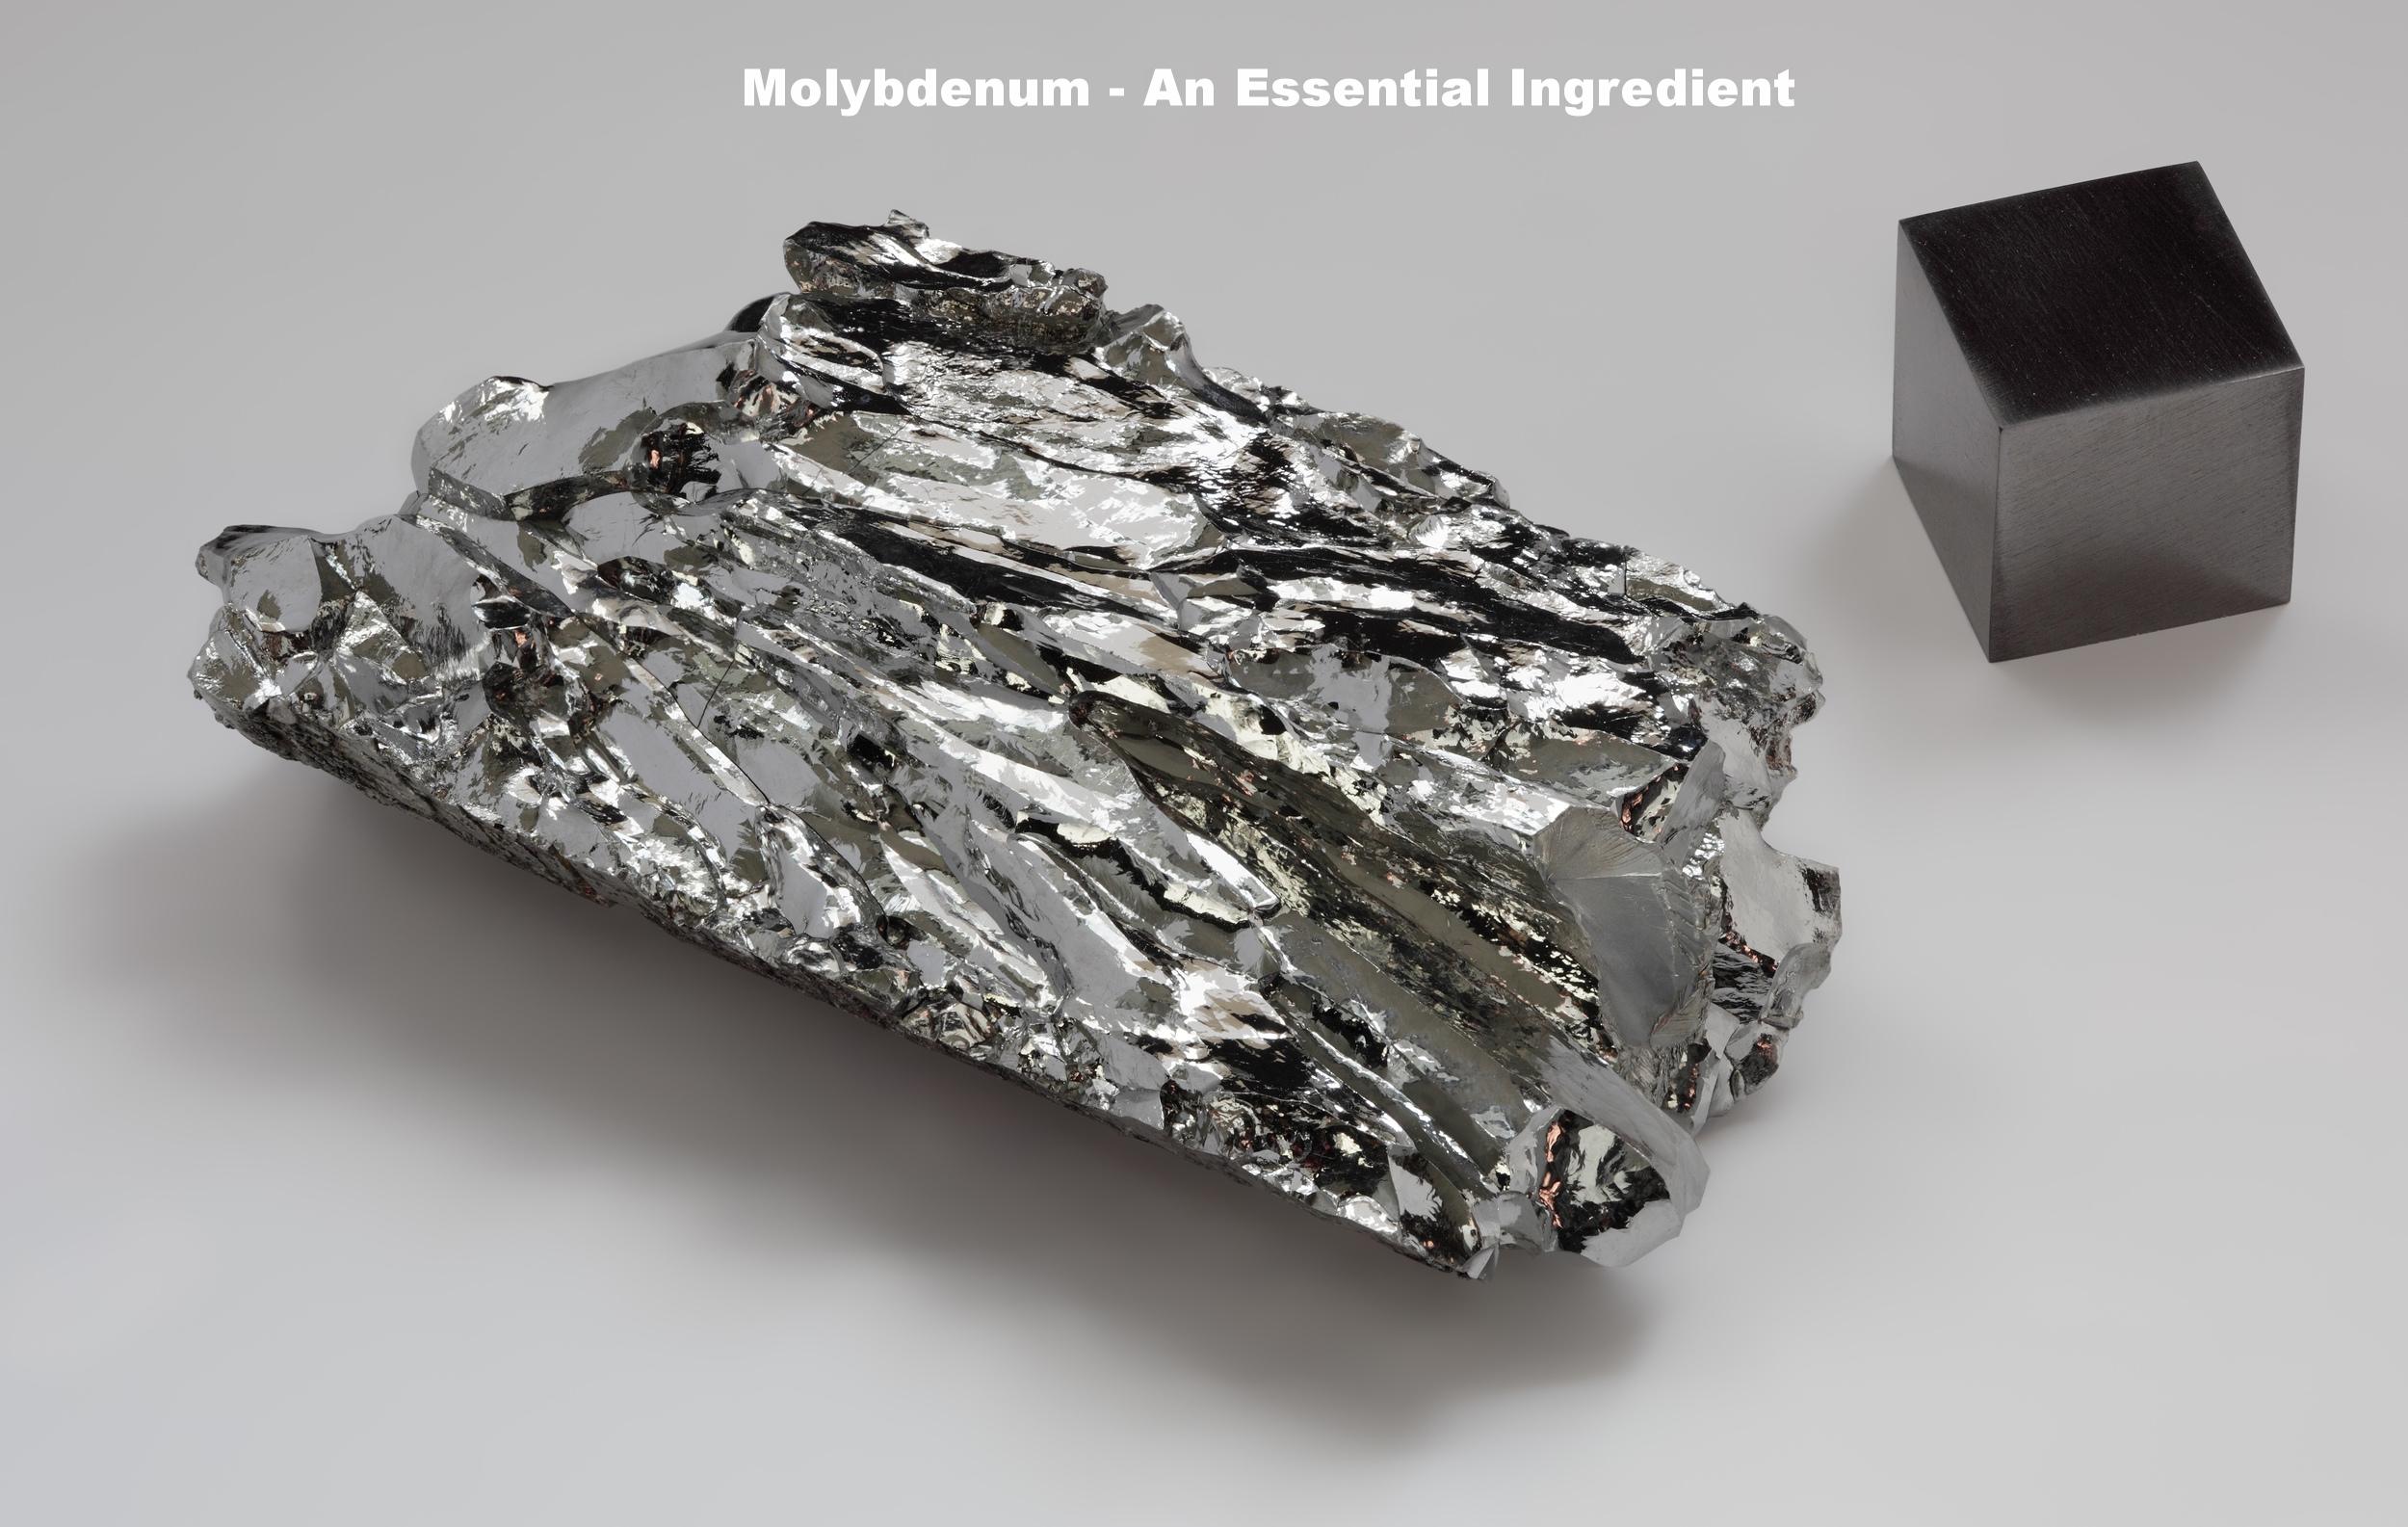 Molybdenum_crystaline_fragment_and_1cm3_cube.jpg